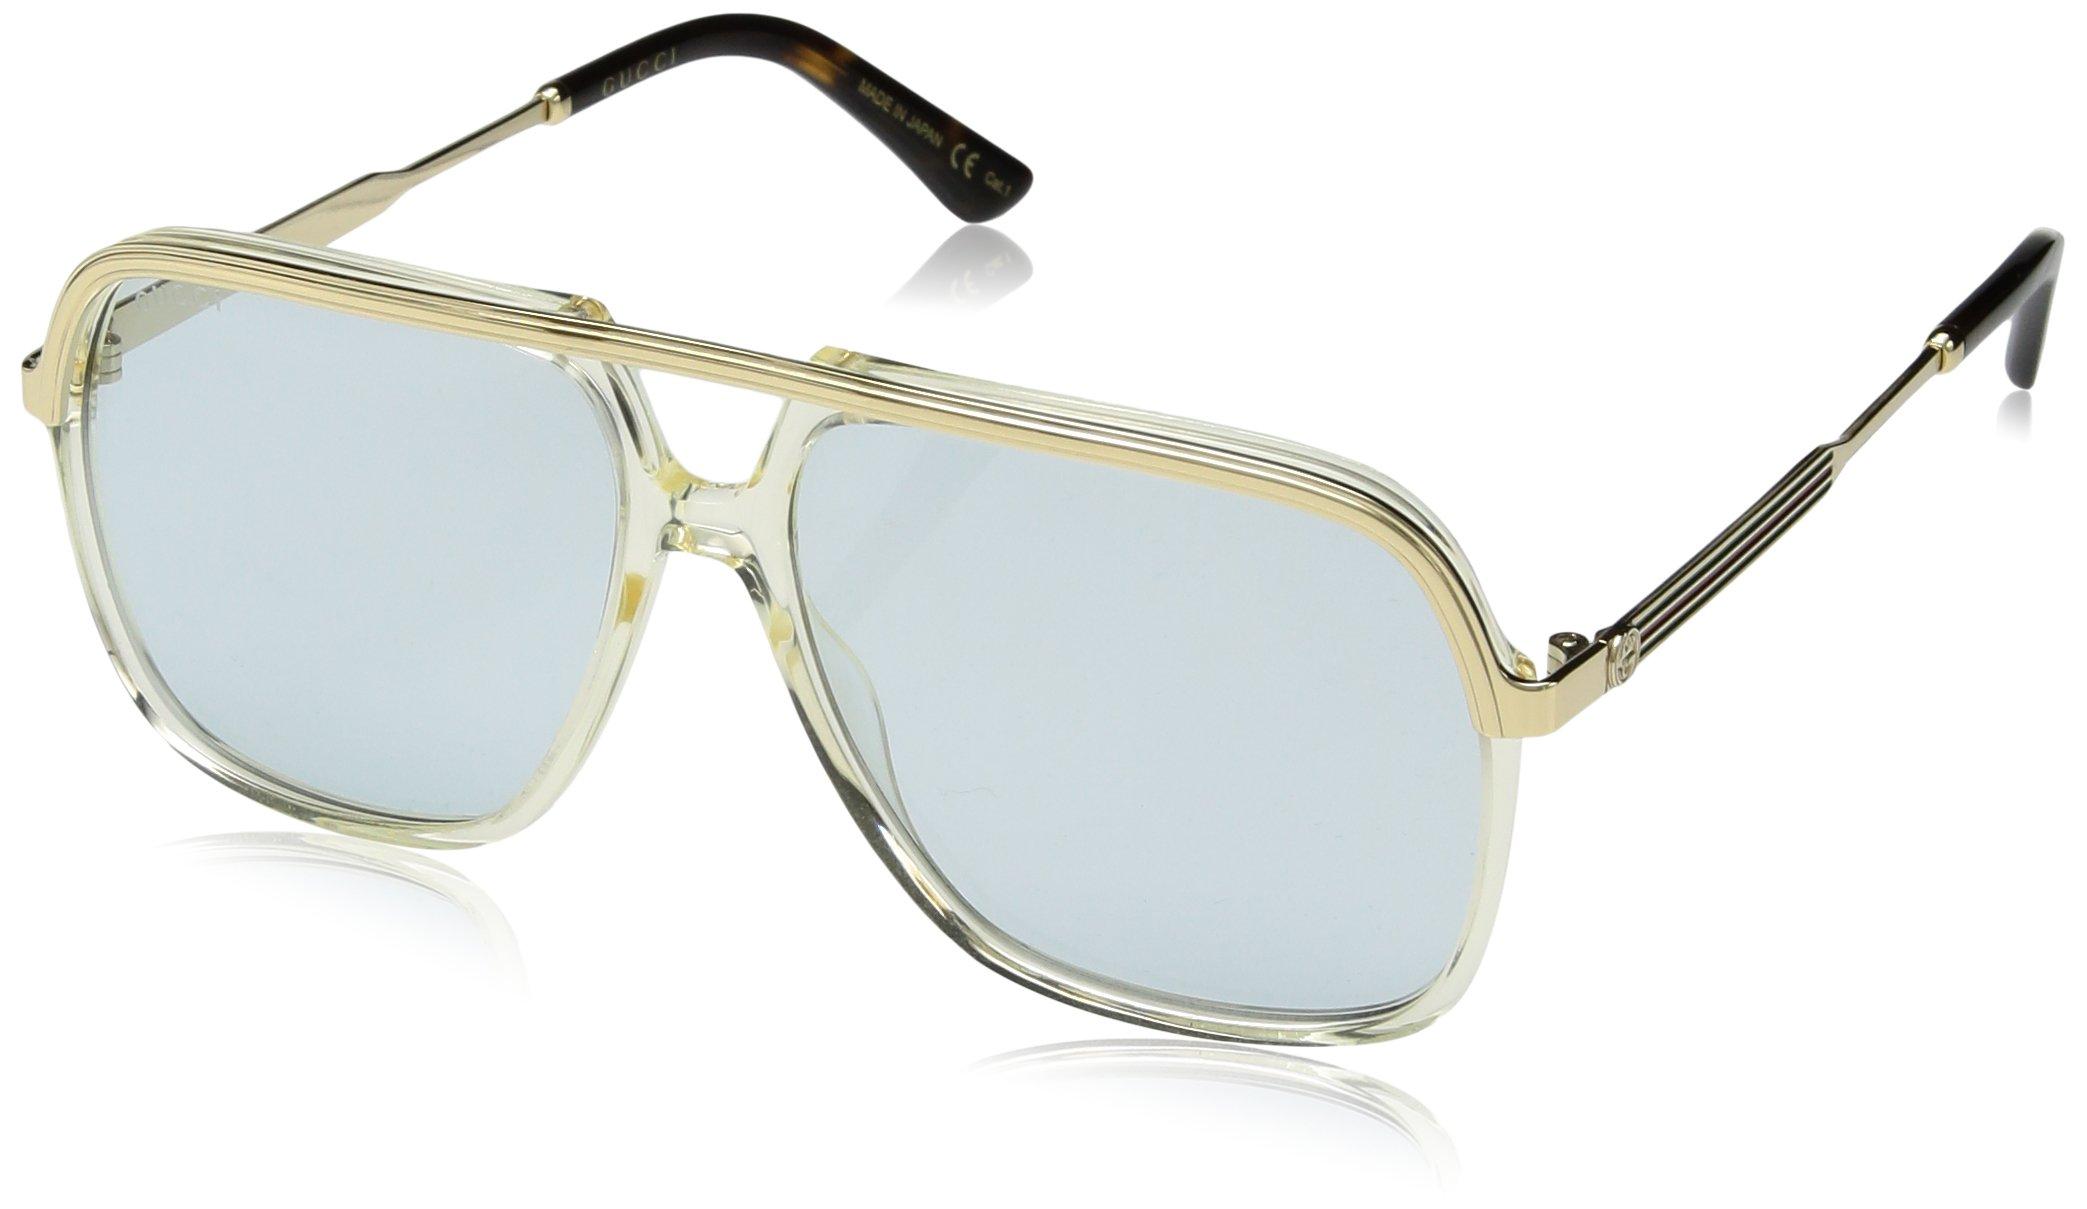 Gucci GG 0200 S- 005 YELLOW / LIGHT BLUE GOLD Sunglasses by Gucci